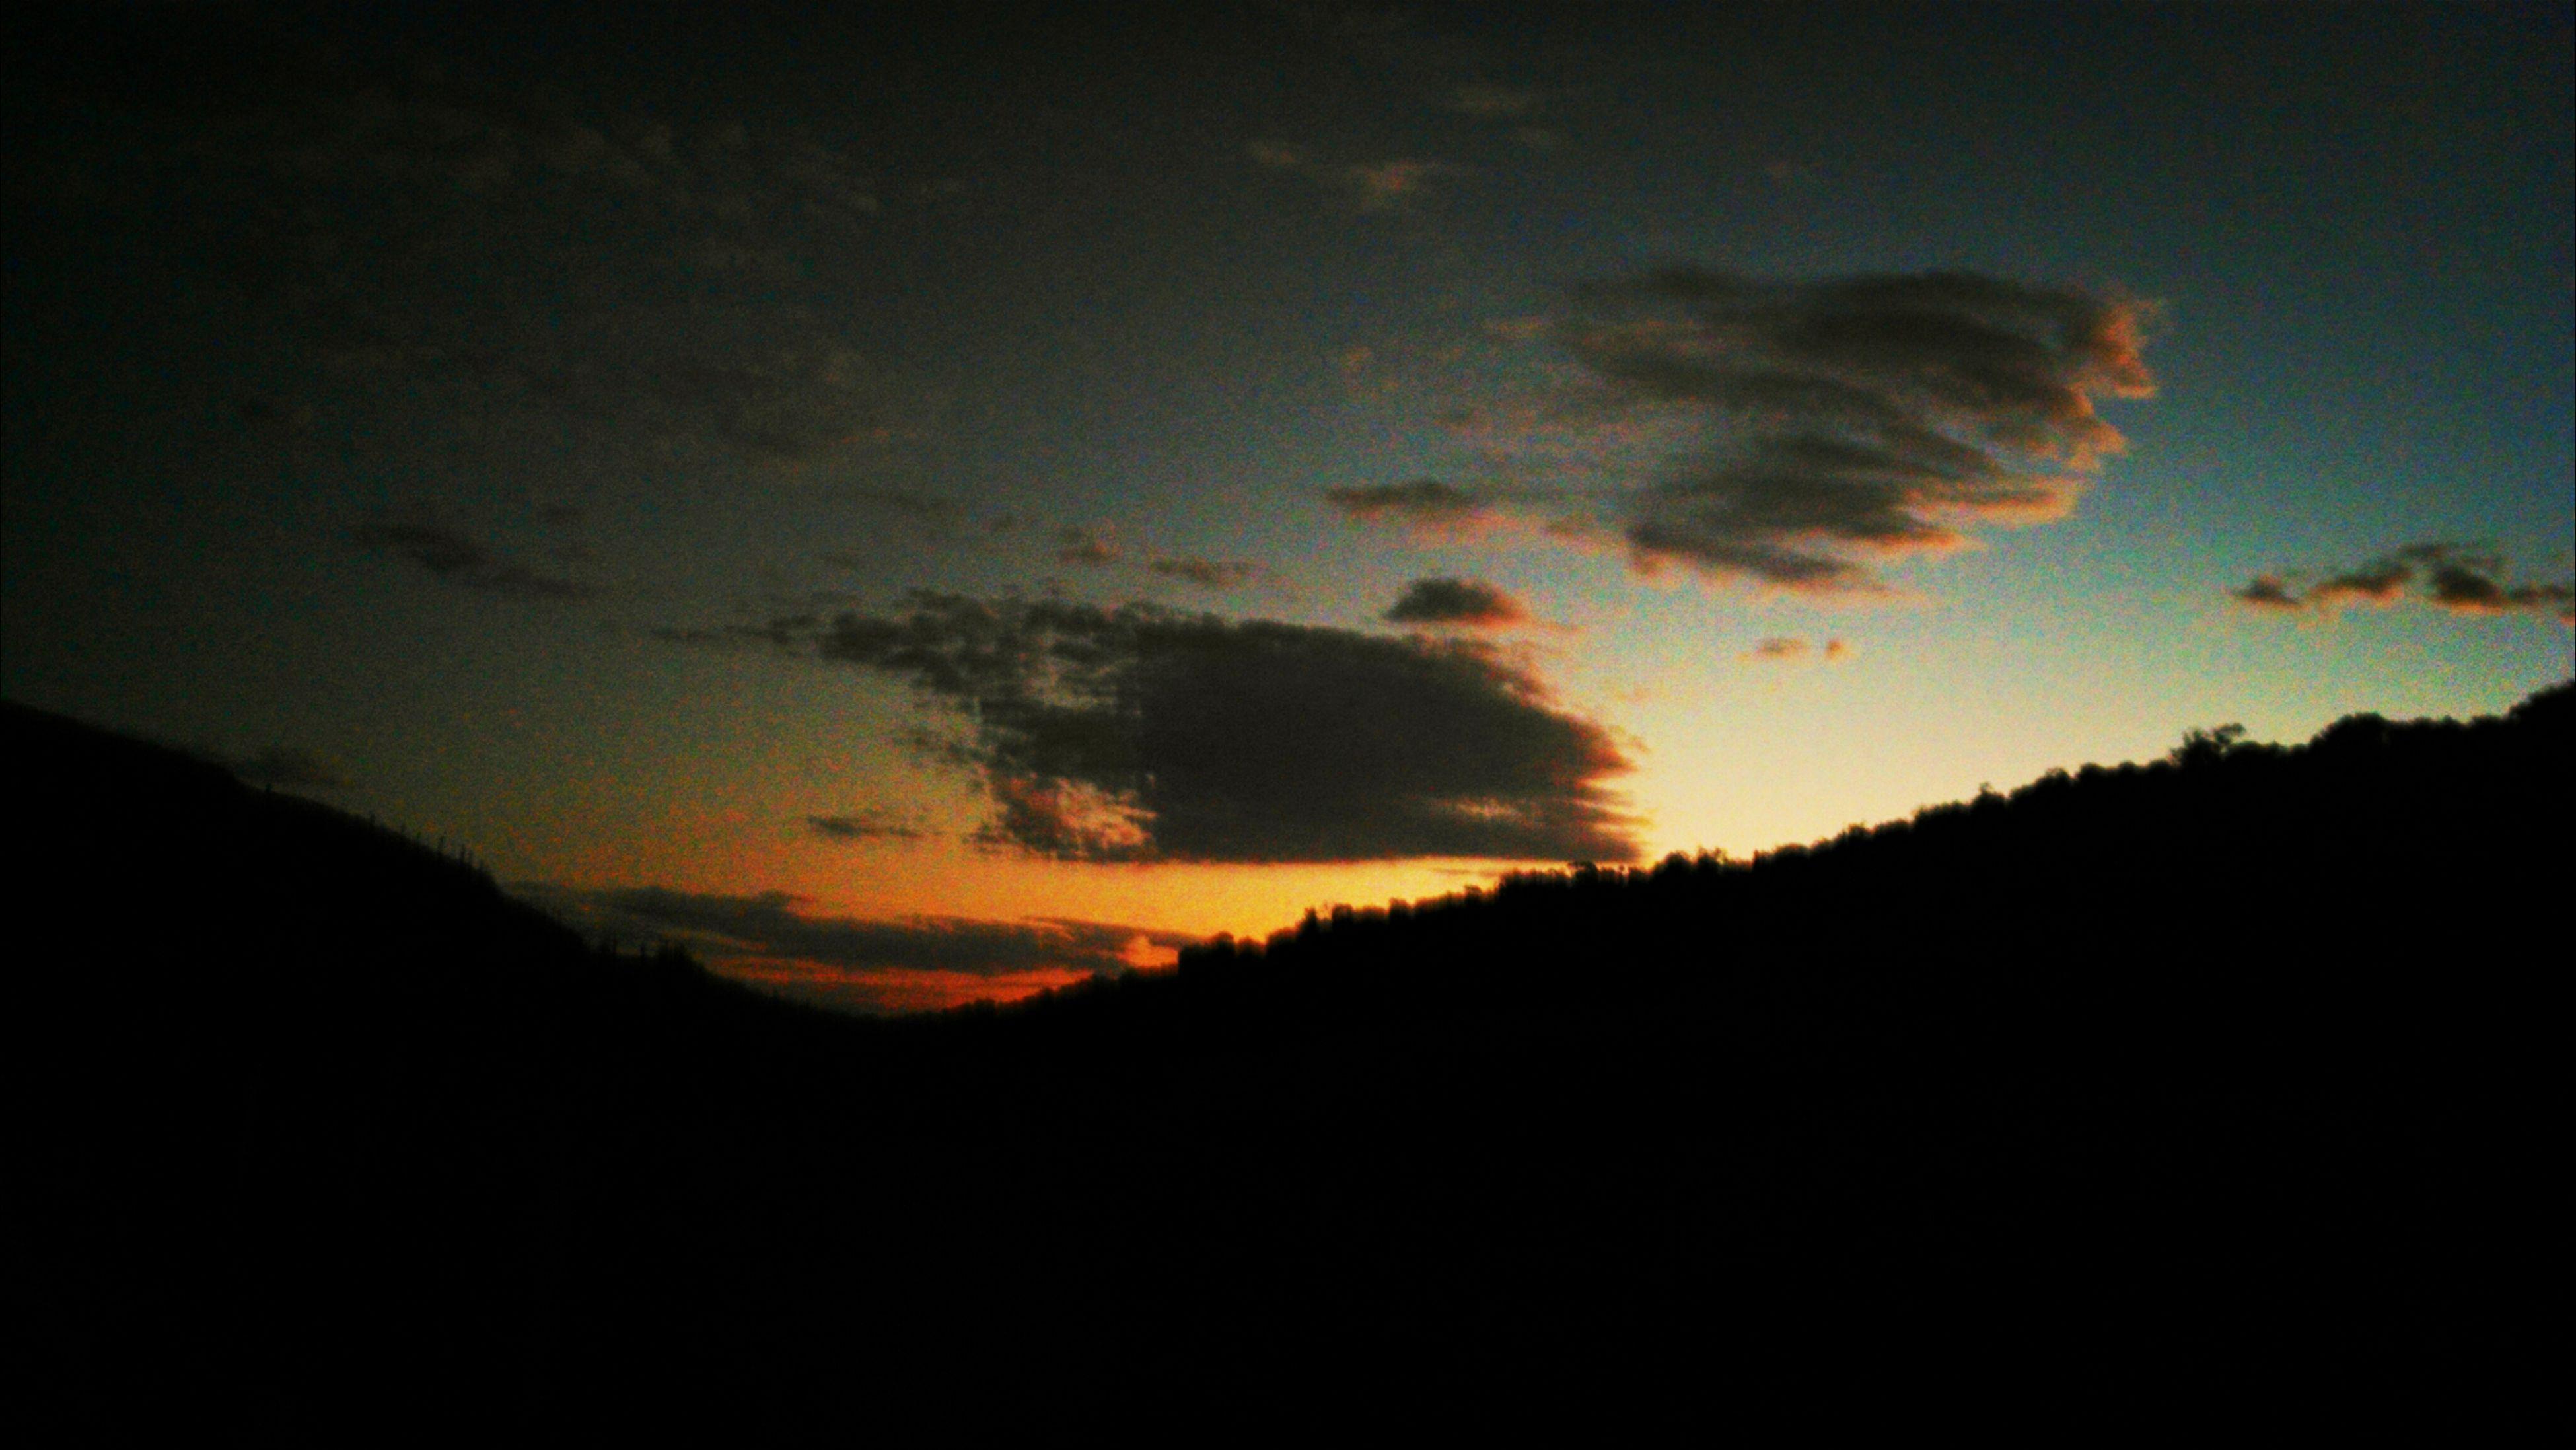 silhouette, sunset, scenics, tranquil scene, sky, beauty in nature, tranquility, dark, idyllic, orange color, nature, cloud - sky, landscape, dramatic sky, copy space, tree, dusk, cloud, majestic, outdoors